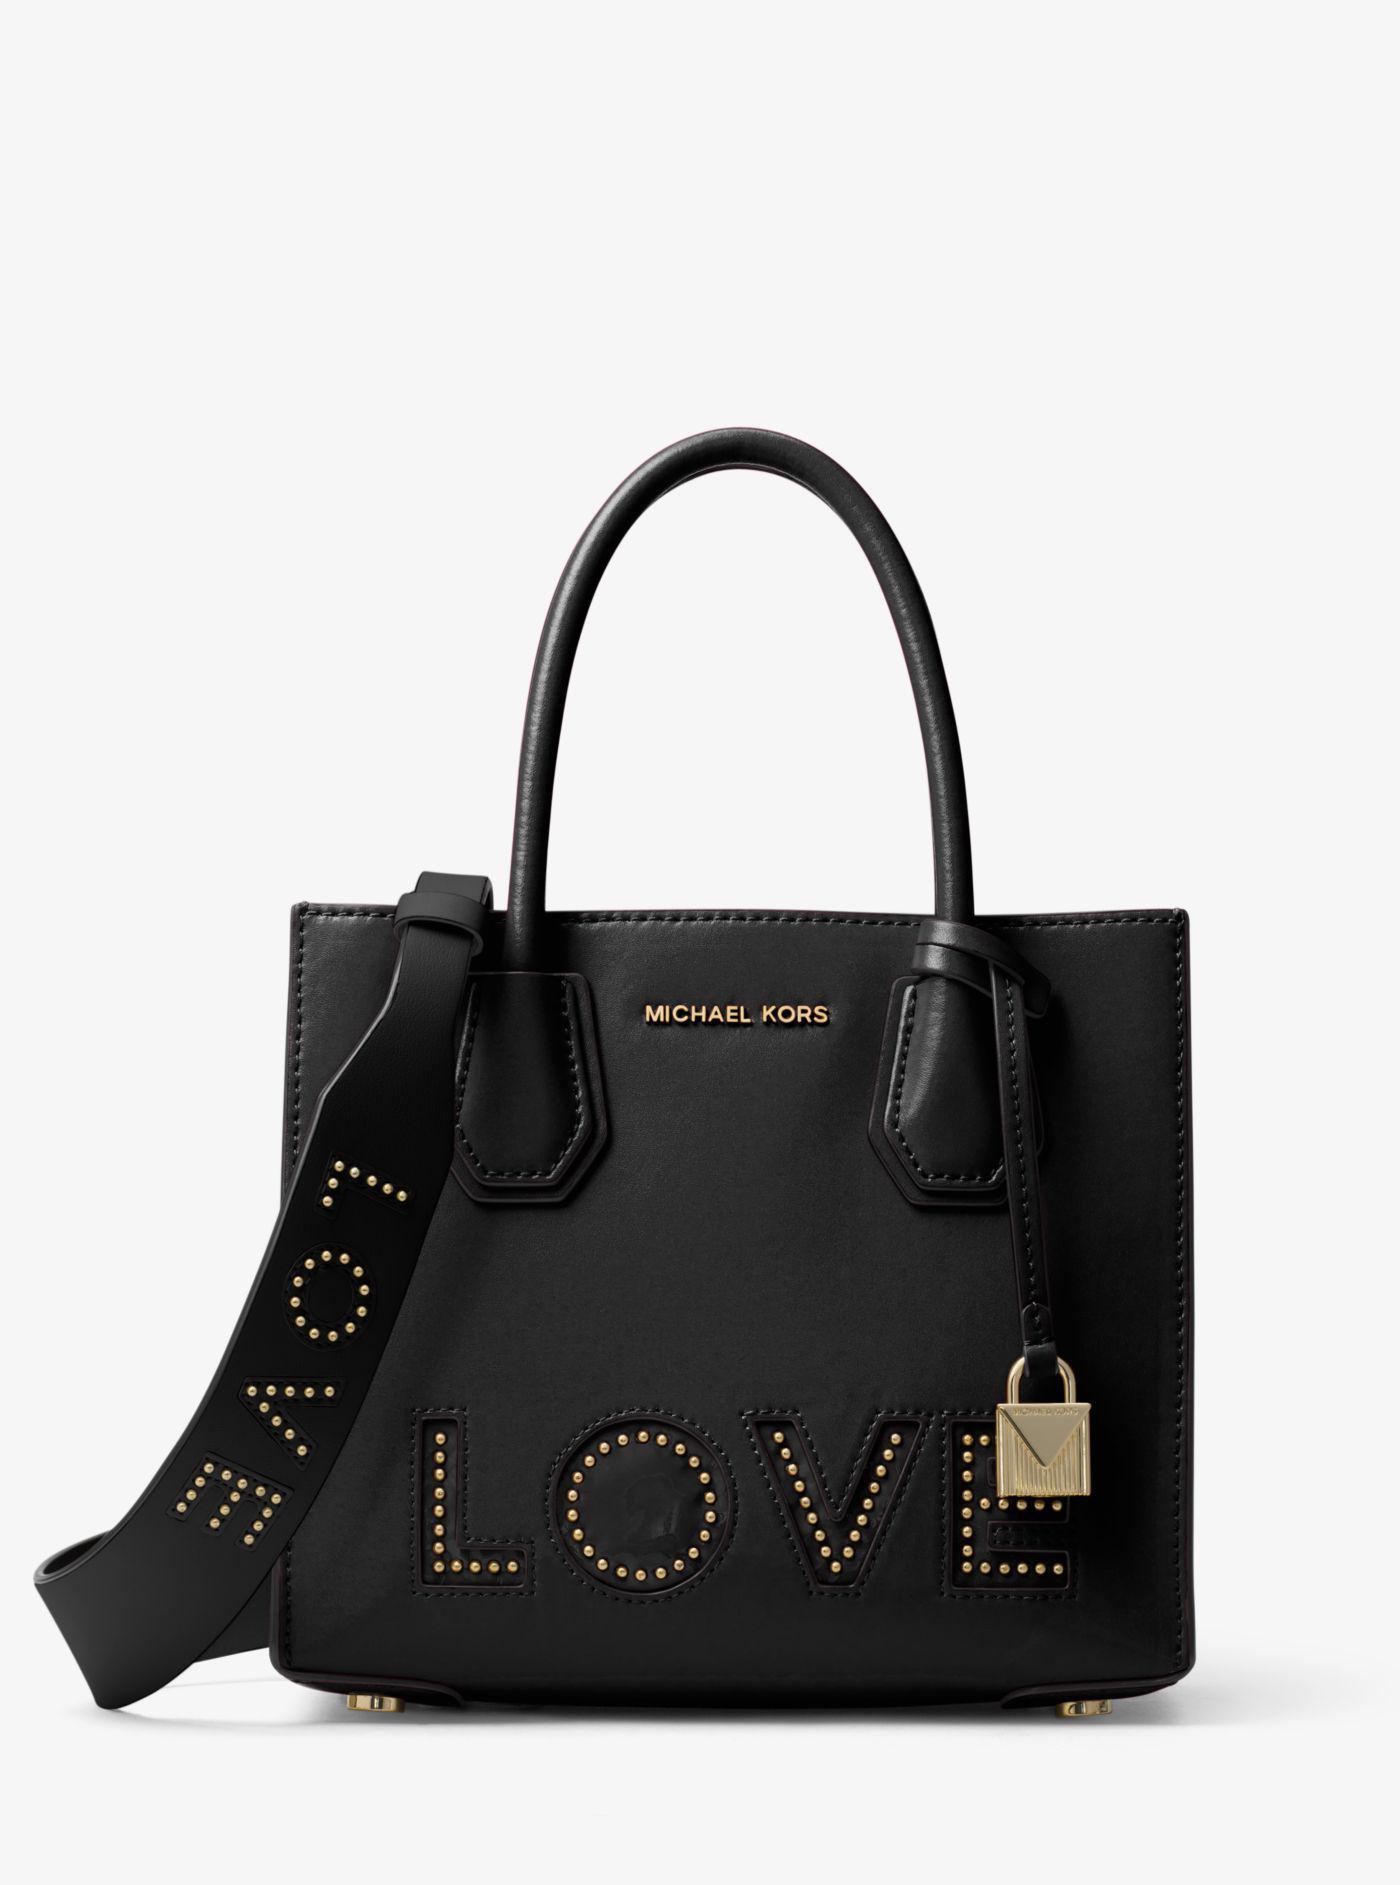 94a8b6baa85a Michael Kors Love Studded Leather Handbag Strap in Black - Lyst